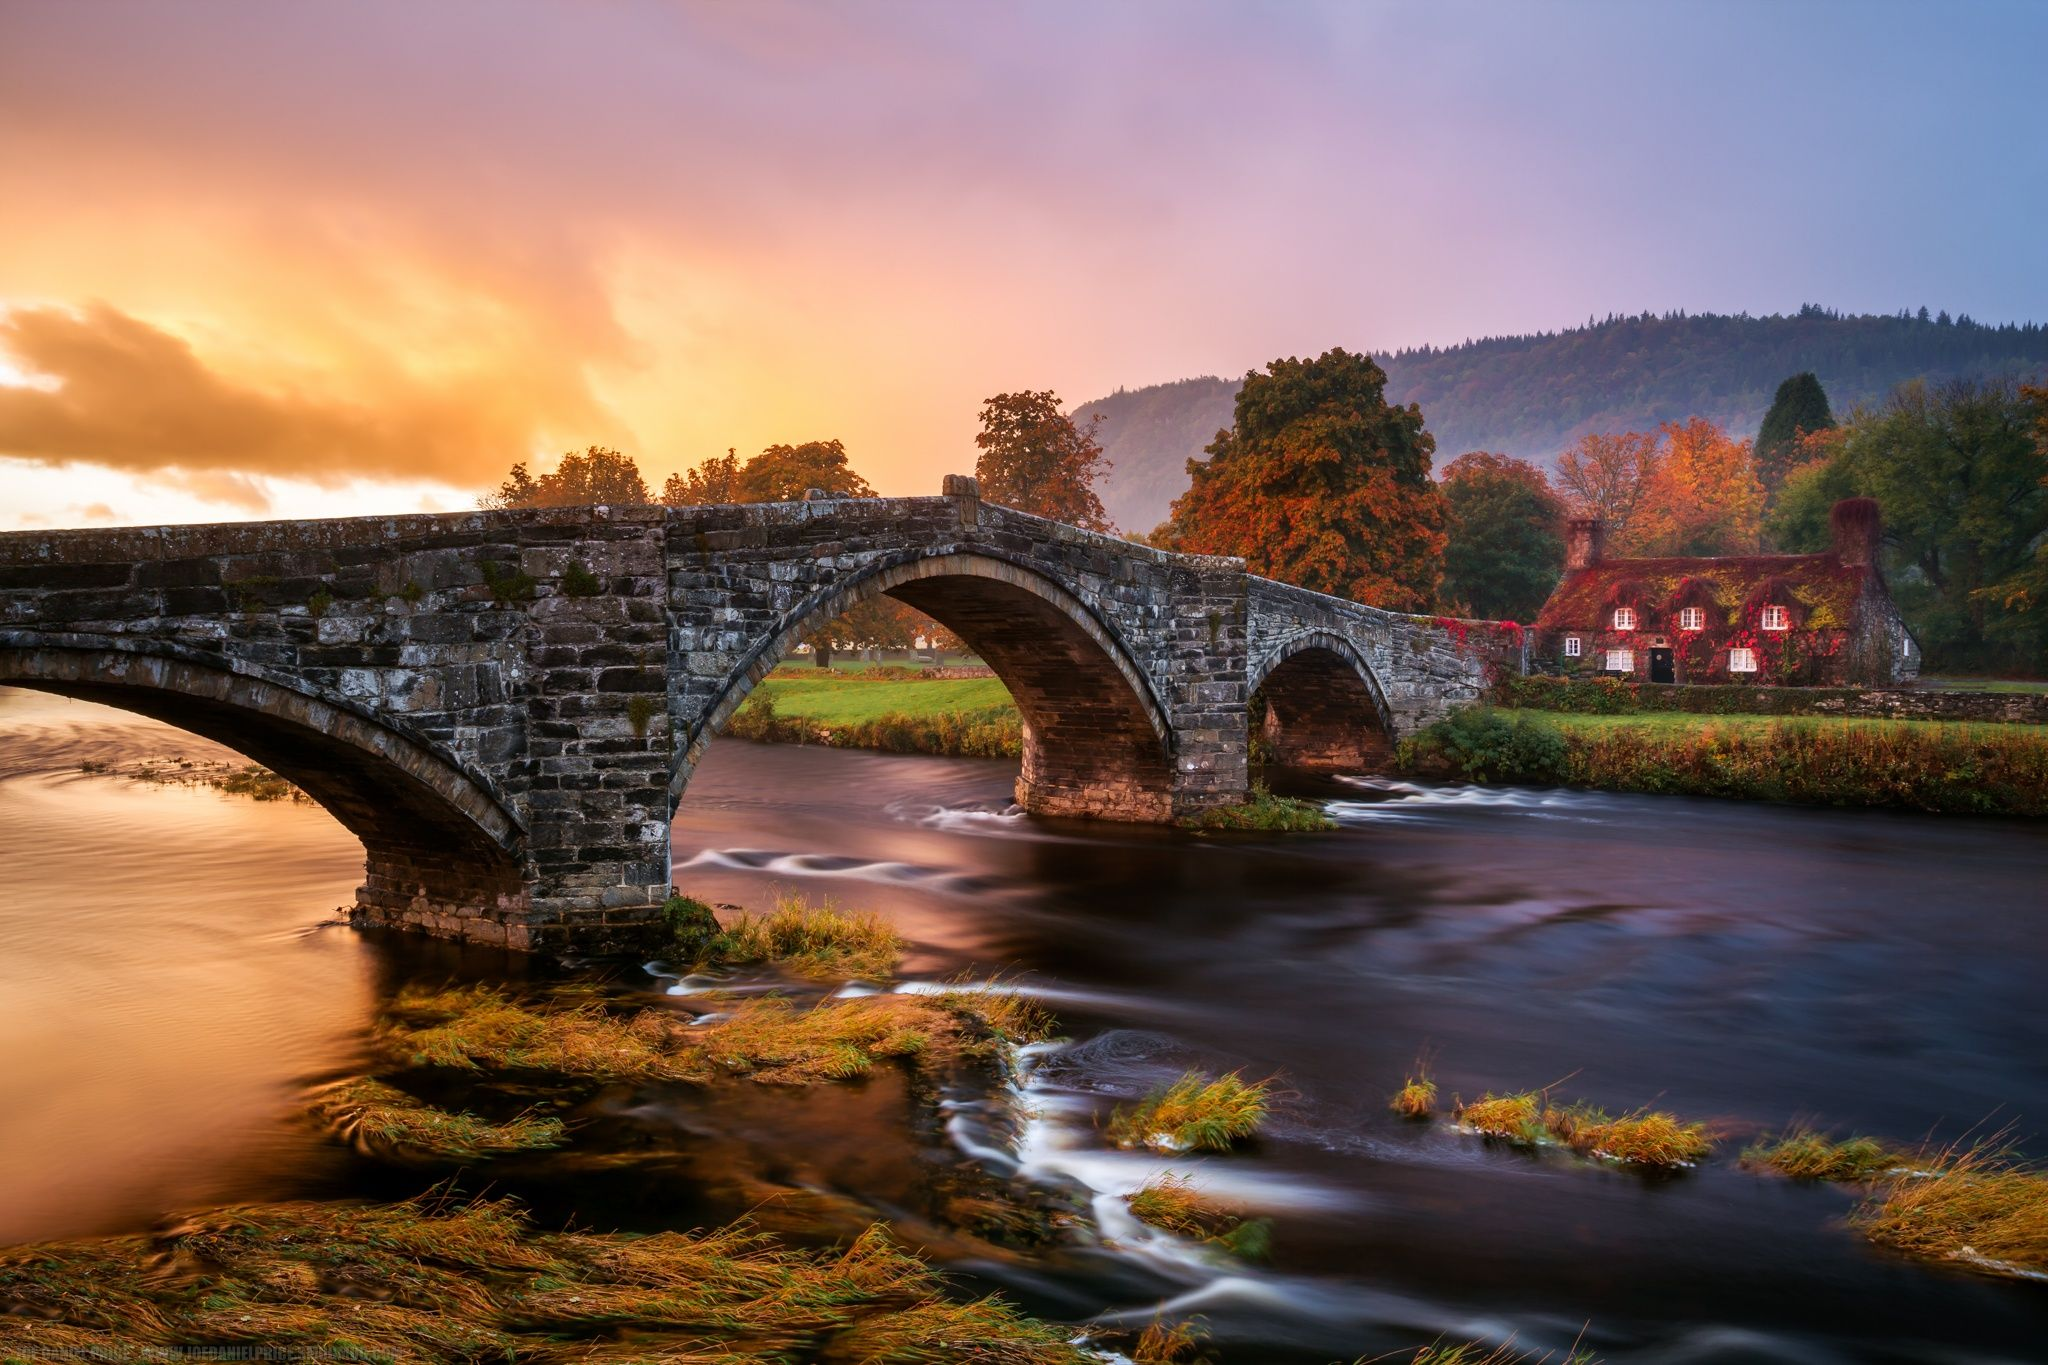 Stormy Sunrise at Llanrwst Tea Rooms, Snowdonia, Wales by Joe Daniel Price on 500px